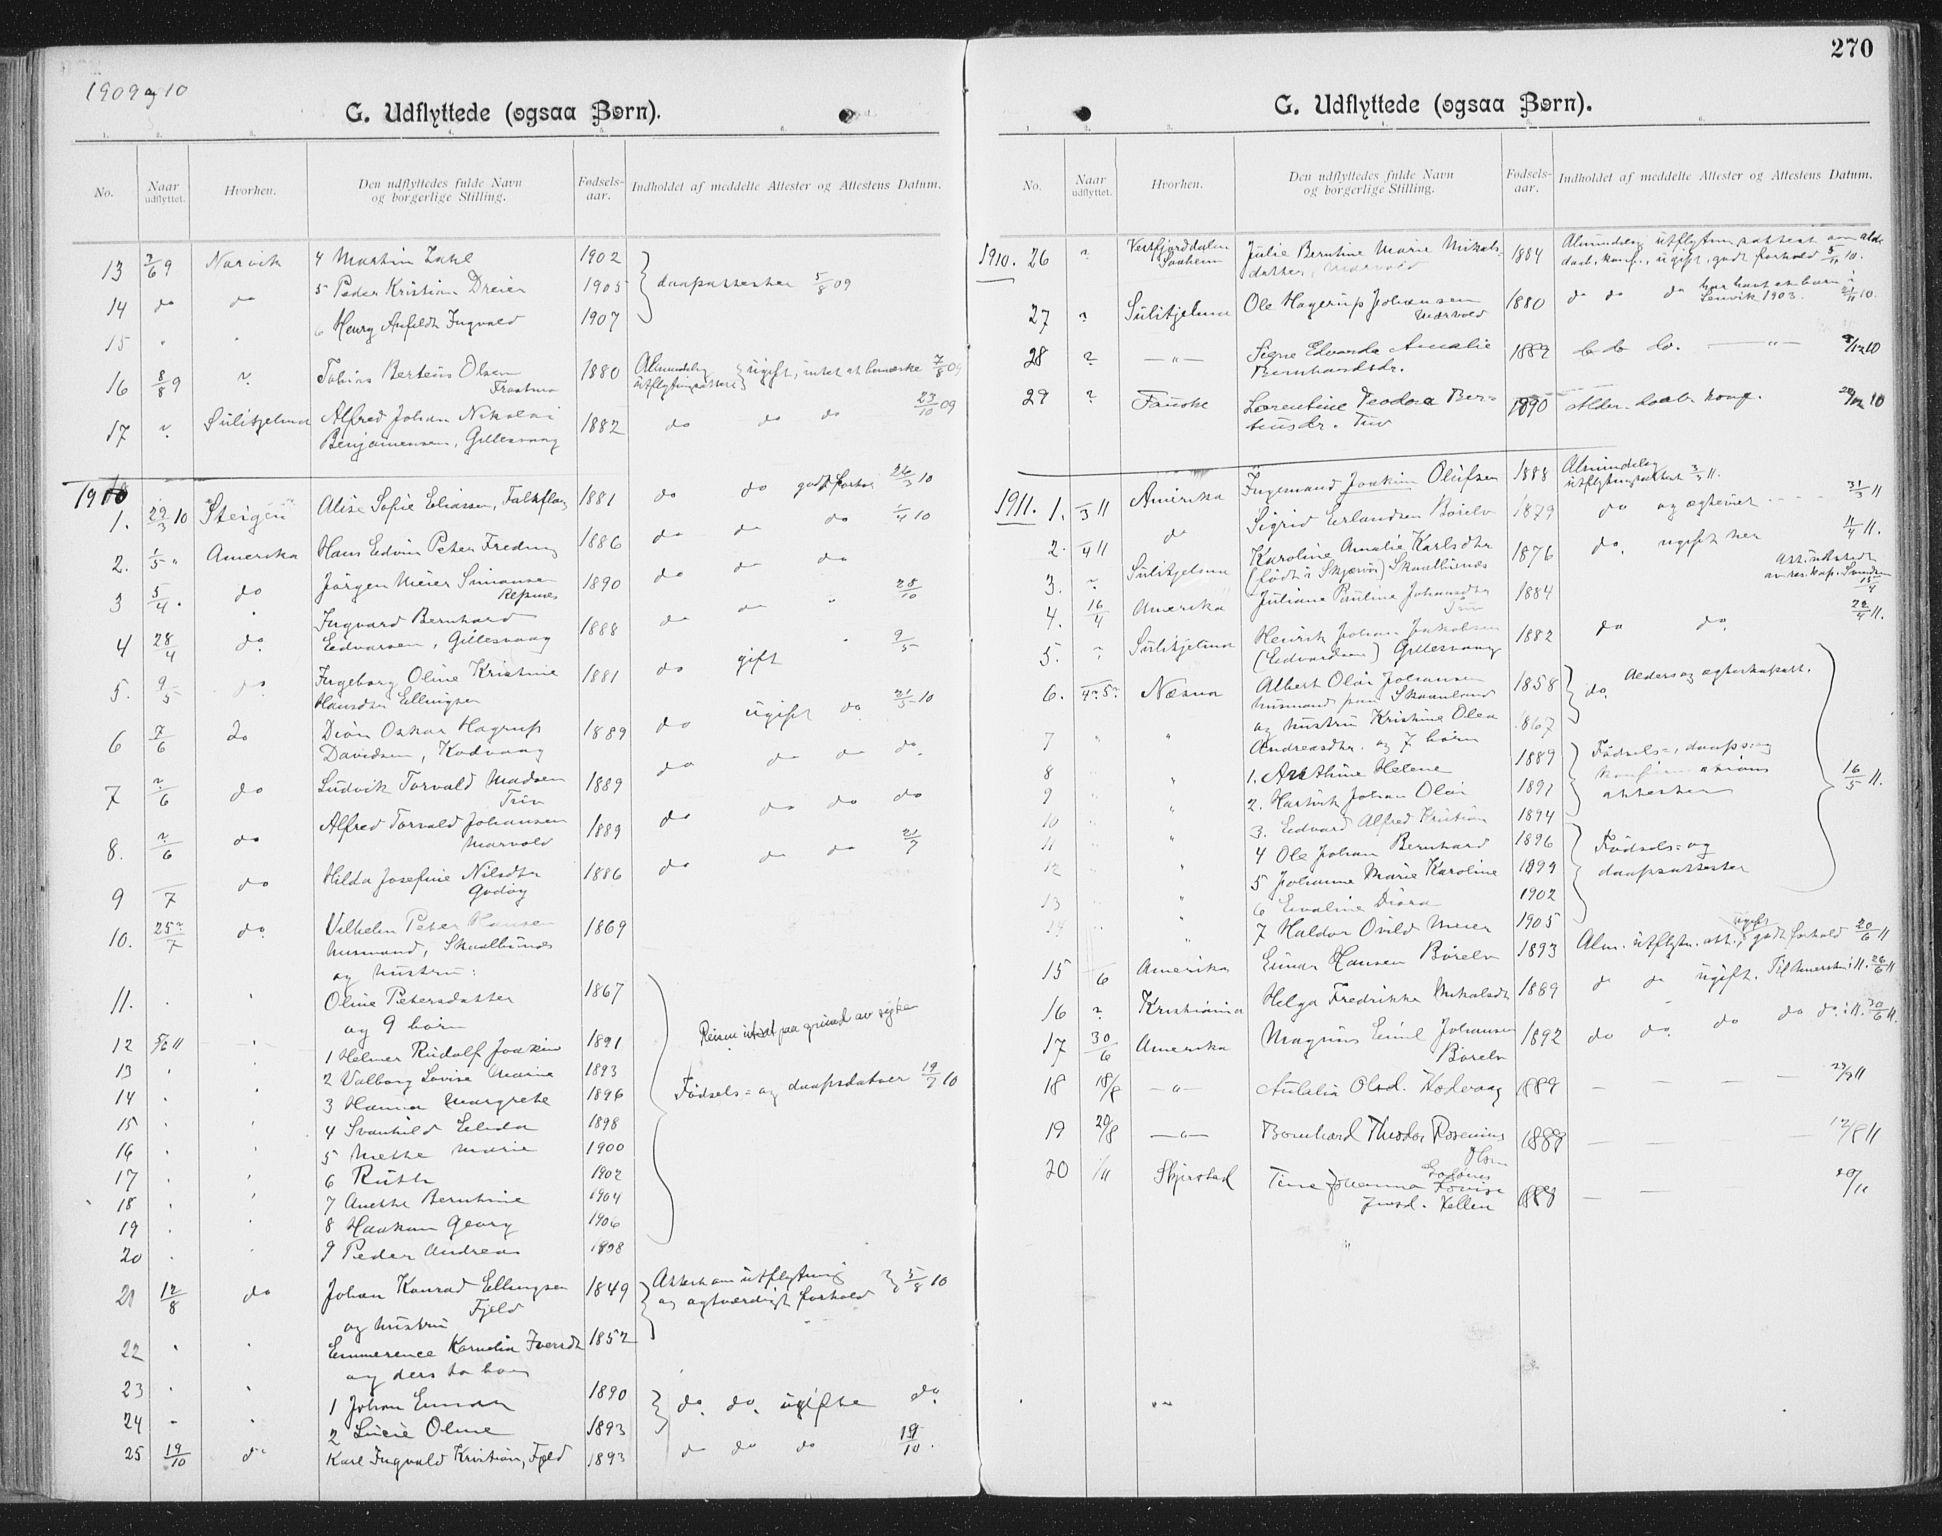 SAT, Ministerialprotokoller, klokkerbøker og fødselsregistre - Nordland, 804/L0081: Ministerialbok nr. 804A02, 1901-1915, s. 270